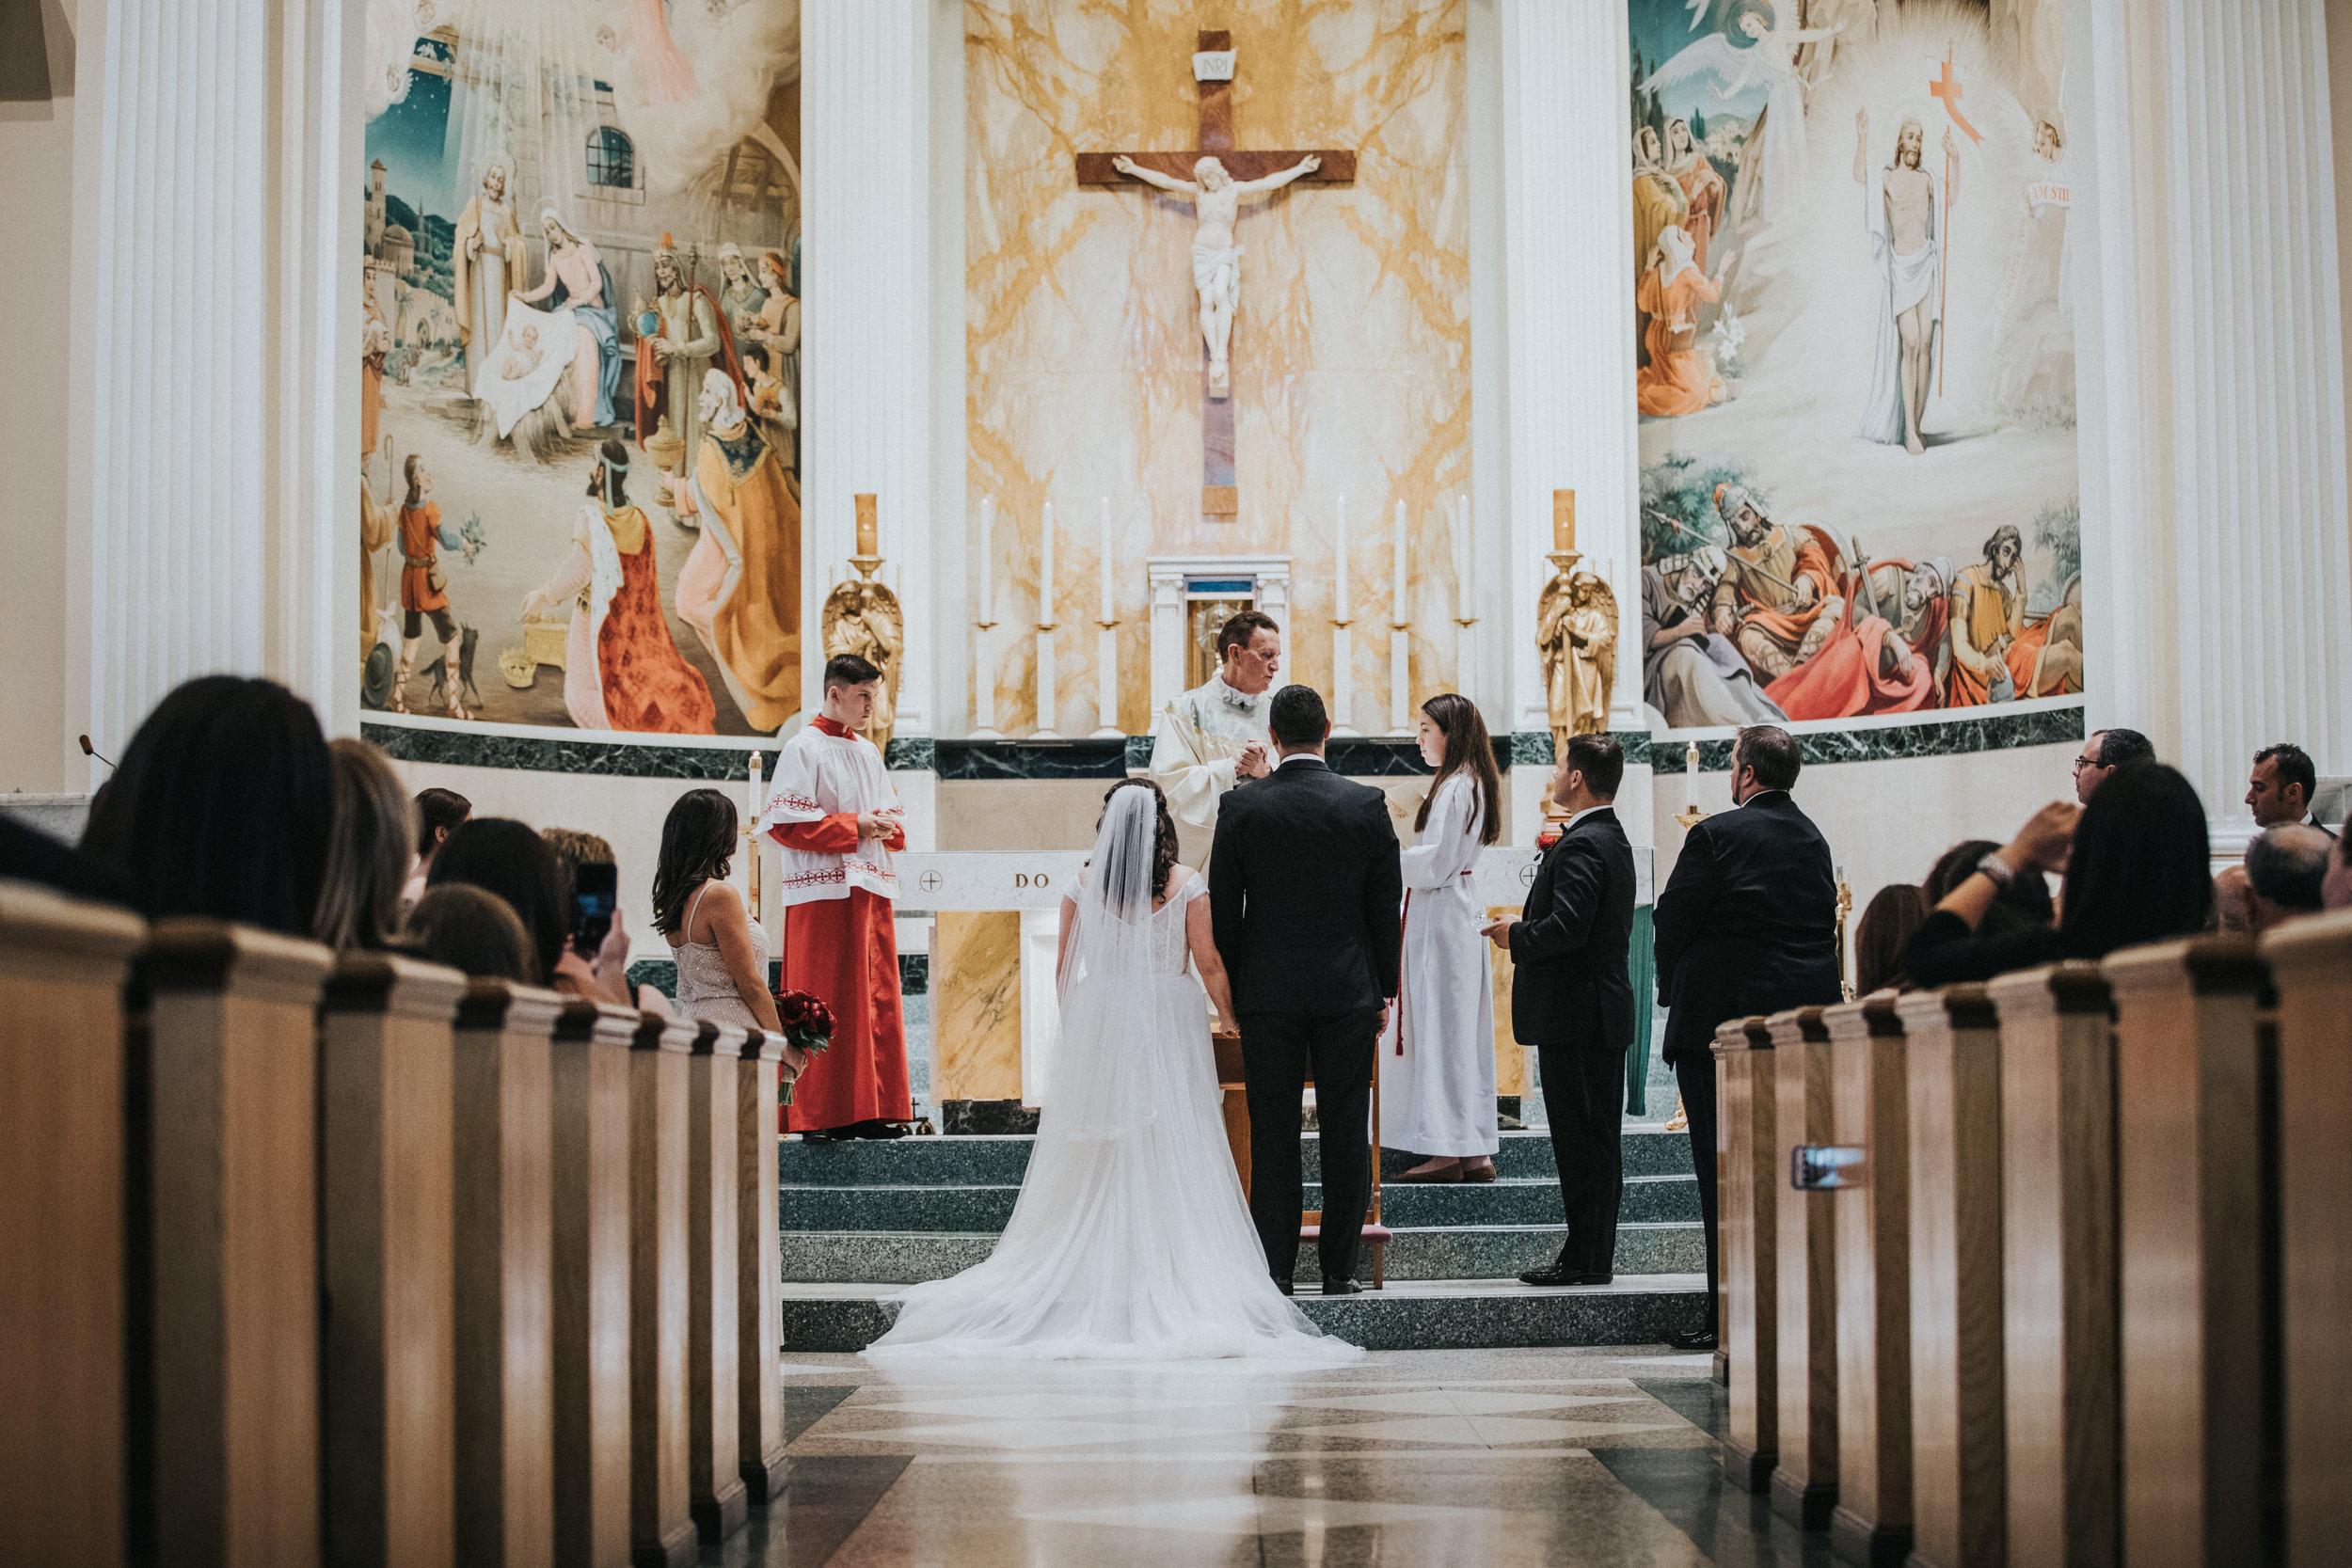 JennaLynnPhotography-NJWeddingPhotographer-Philadelphia-Wedding-ArtsBallroom-Ceremony-50.jpg